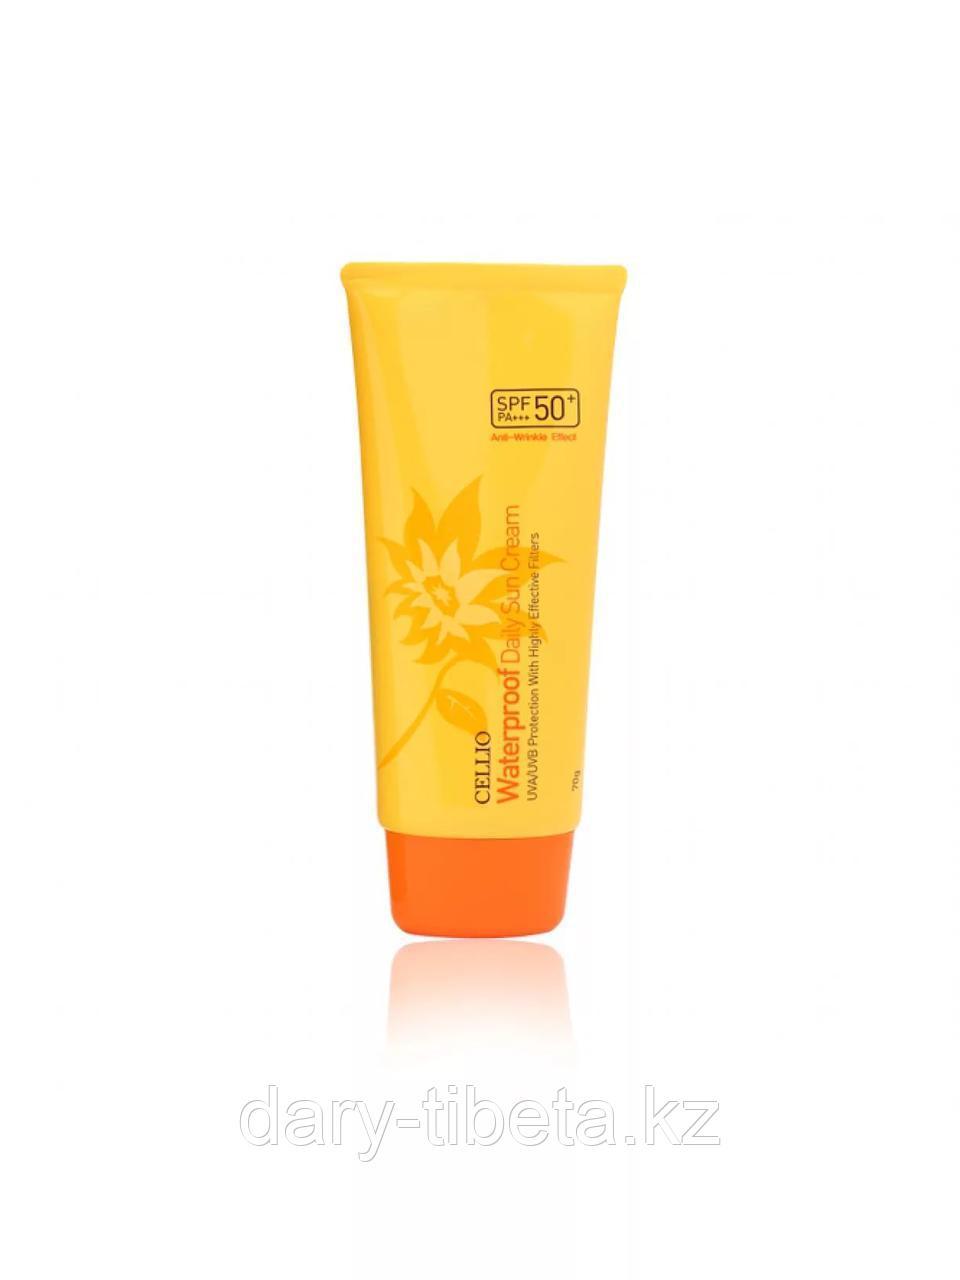 CELLIO WATERPROOF DAILY SUN CREAM 50+/PA-Водостойкий солнцезащитный крем